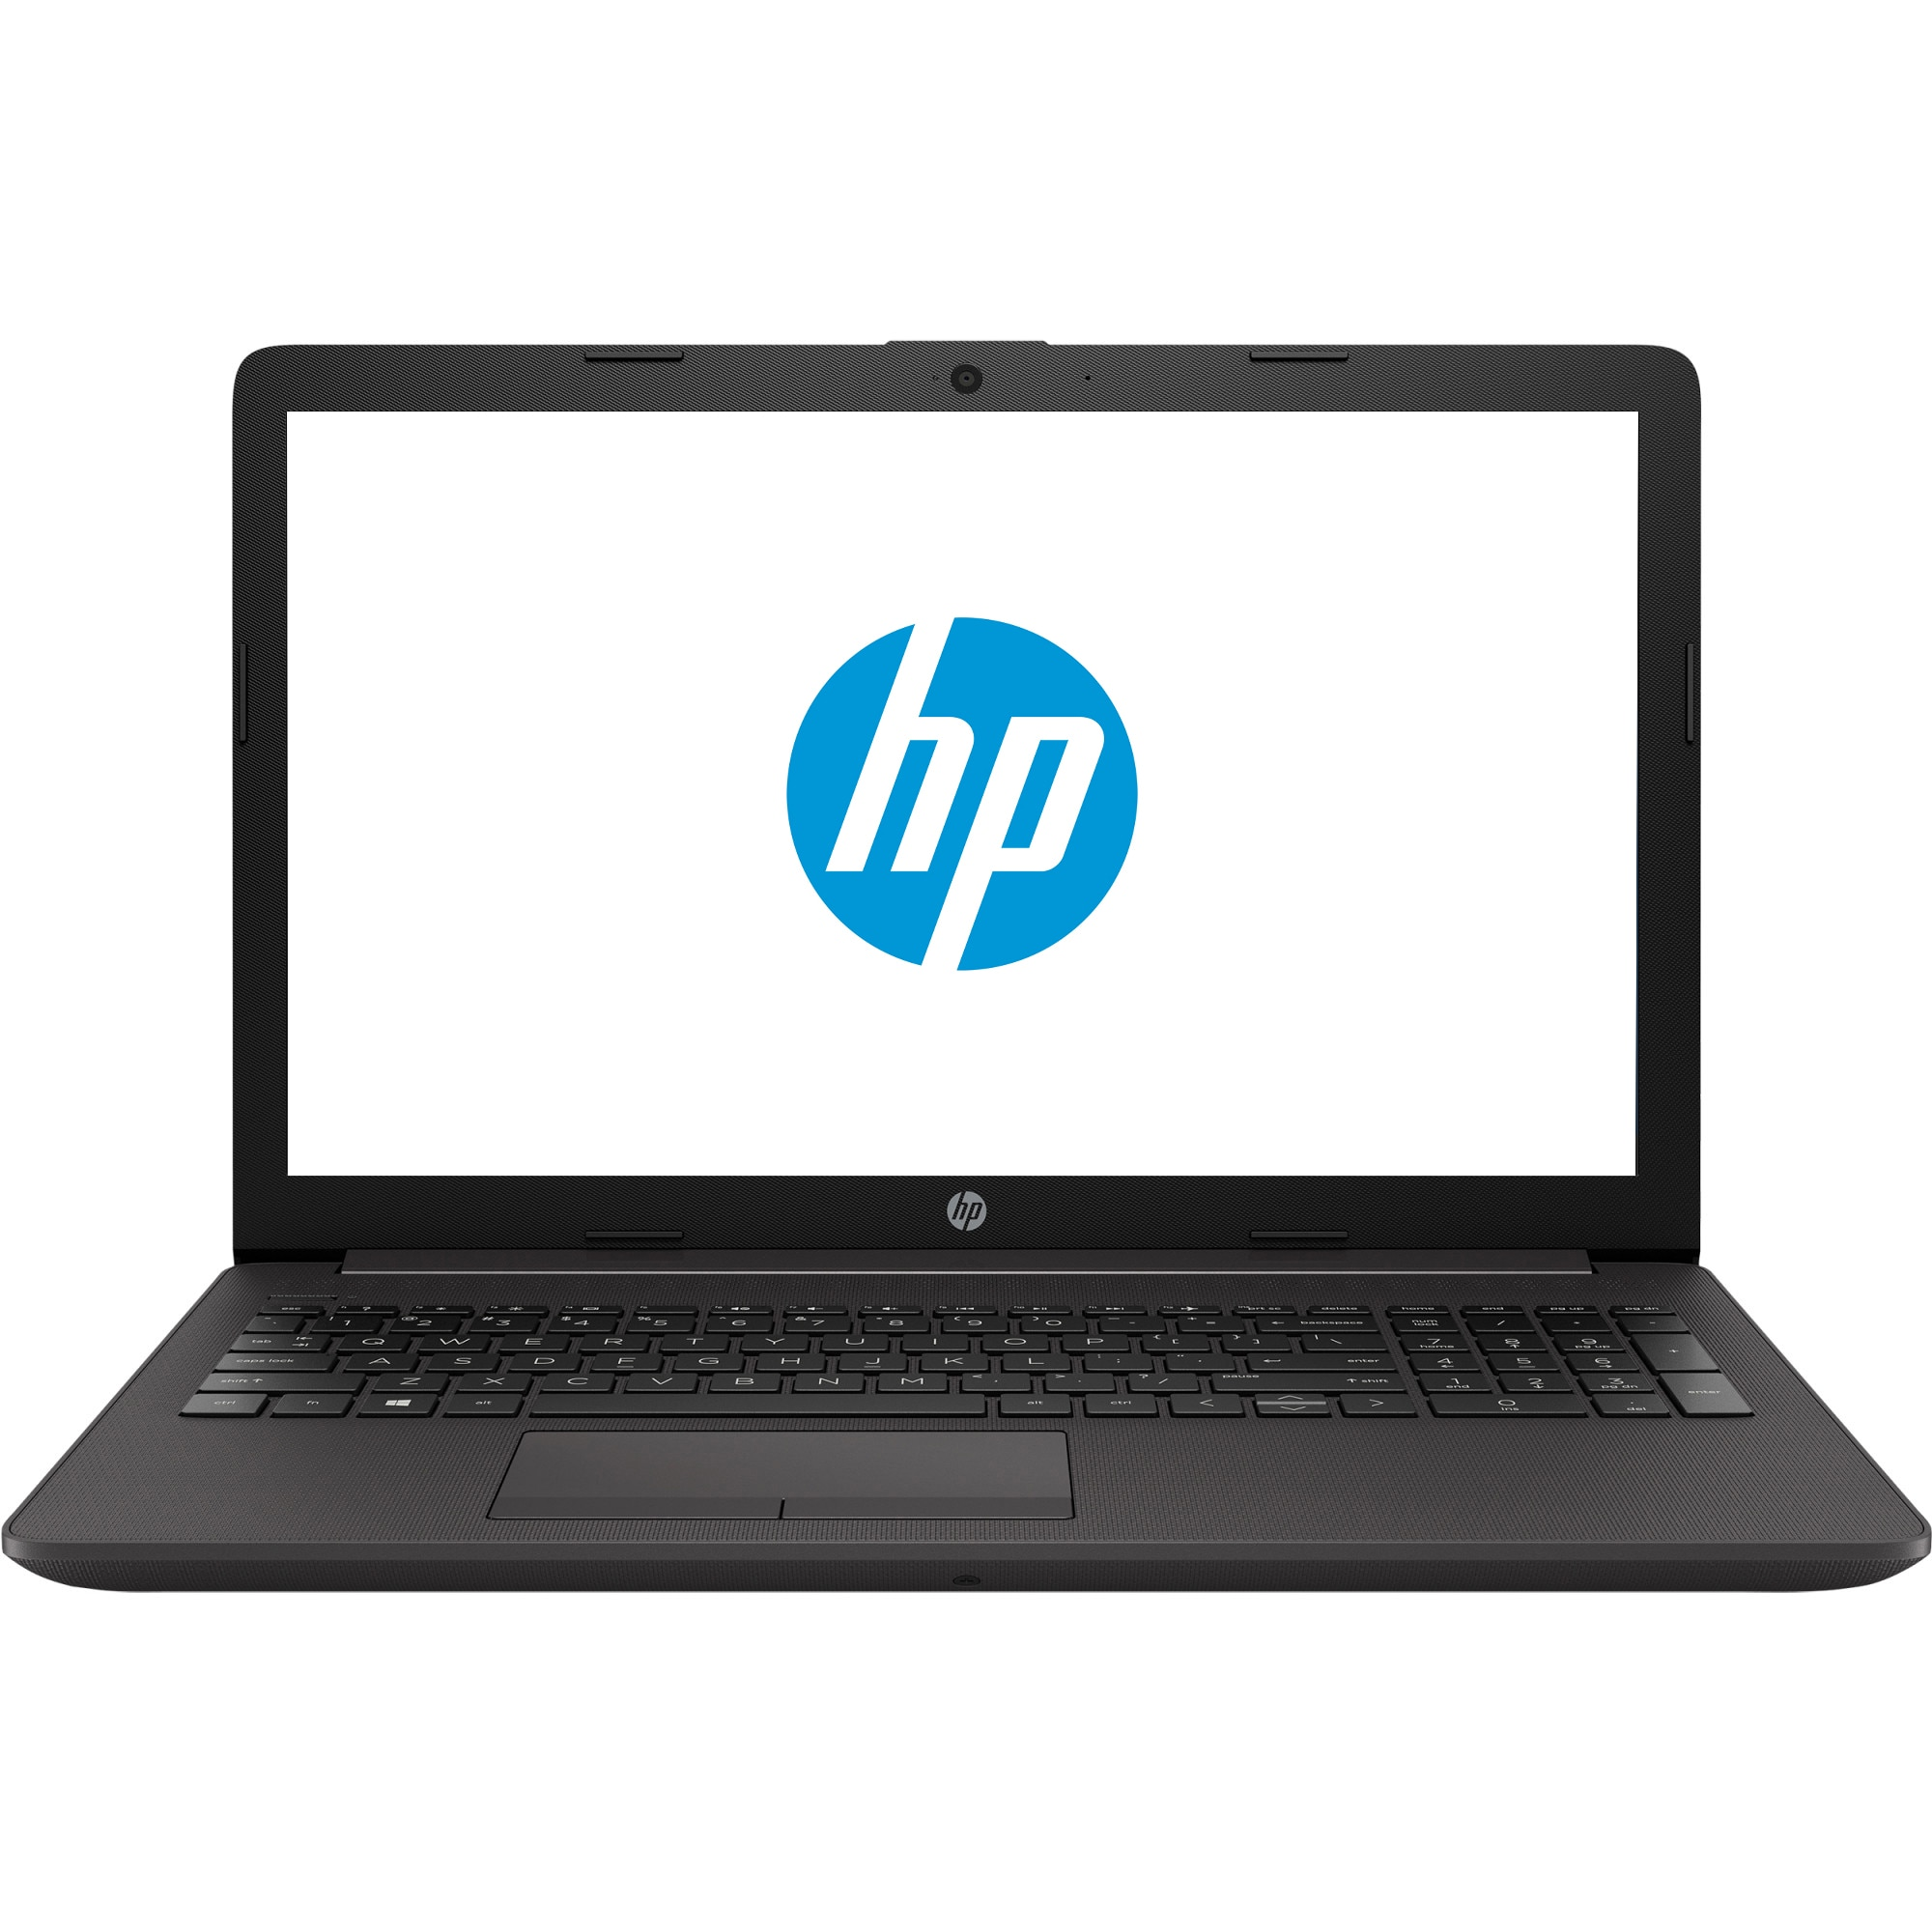 "Fotografie Laptop HP 255 G7 cu procesor AMD Ryzen 3 3200U pana la 3.50 GHz, 15.6"", Full HD, 8GB, 256GB SSD, AMD Radeon Vega Grahics, Free DOS, Dark Ash Silver"